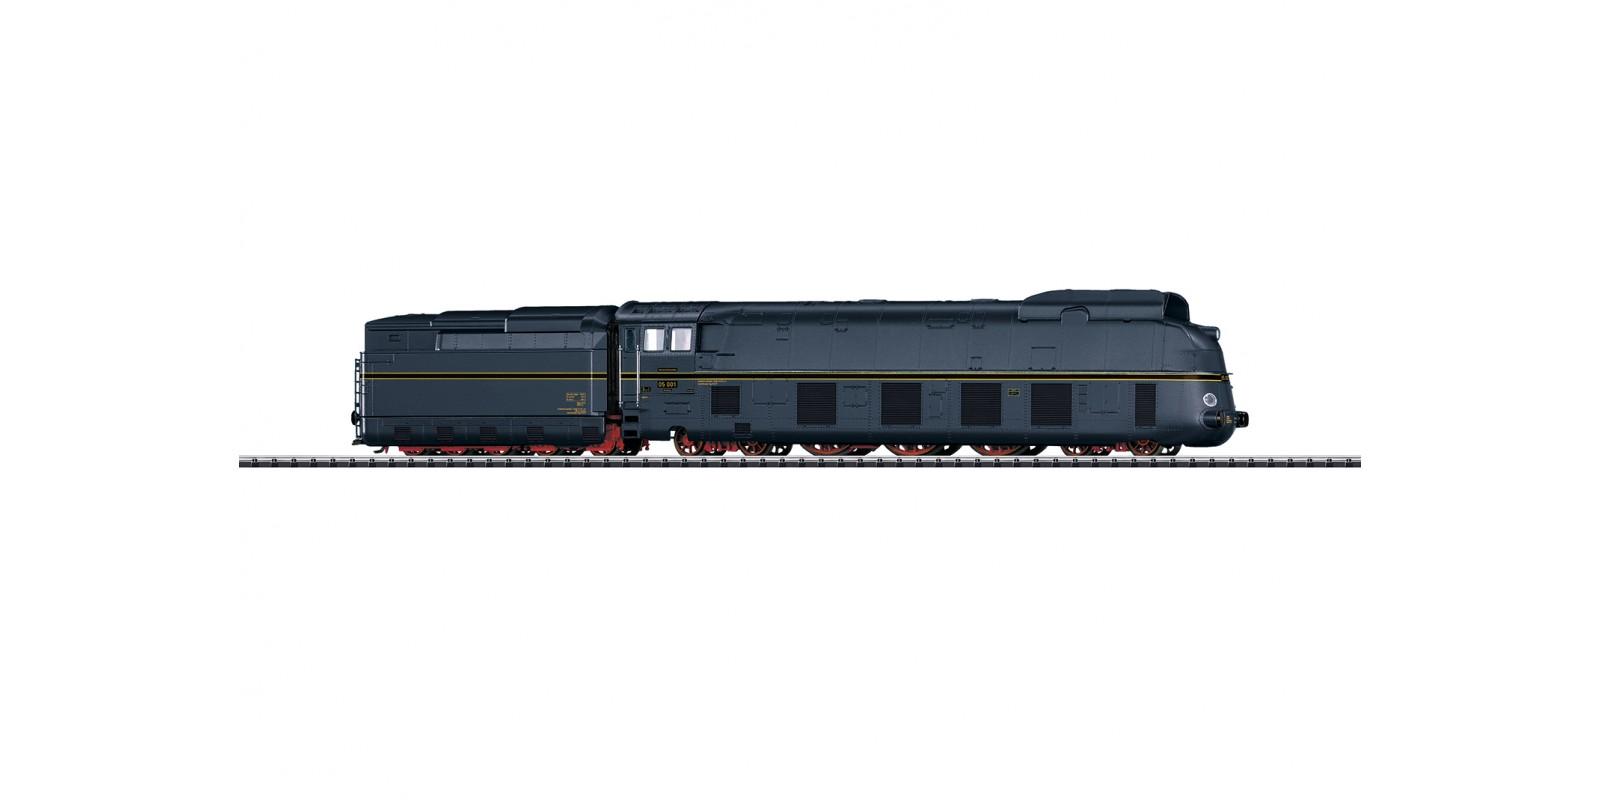 T22917 Streamline express steam locomotive with Tender BR 05